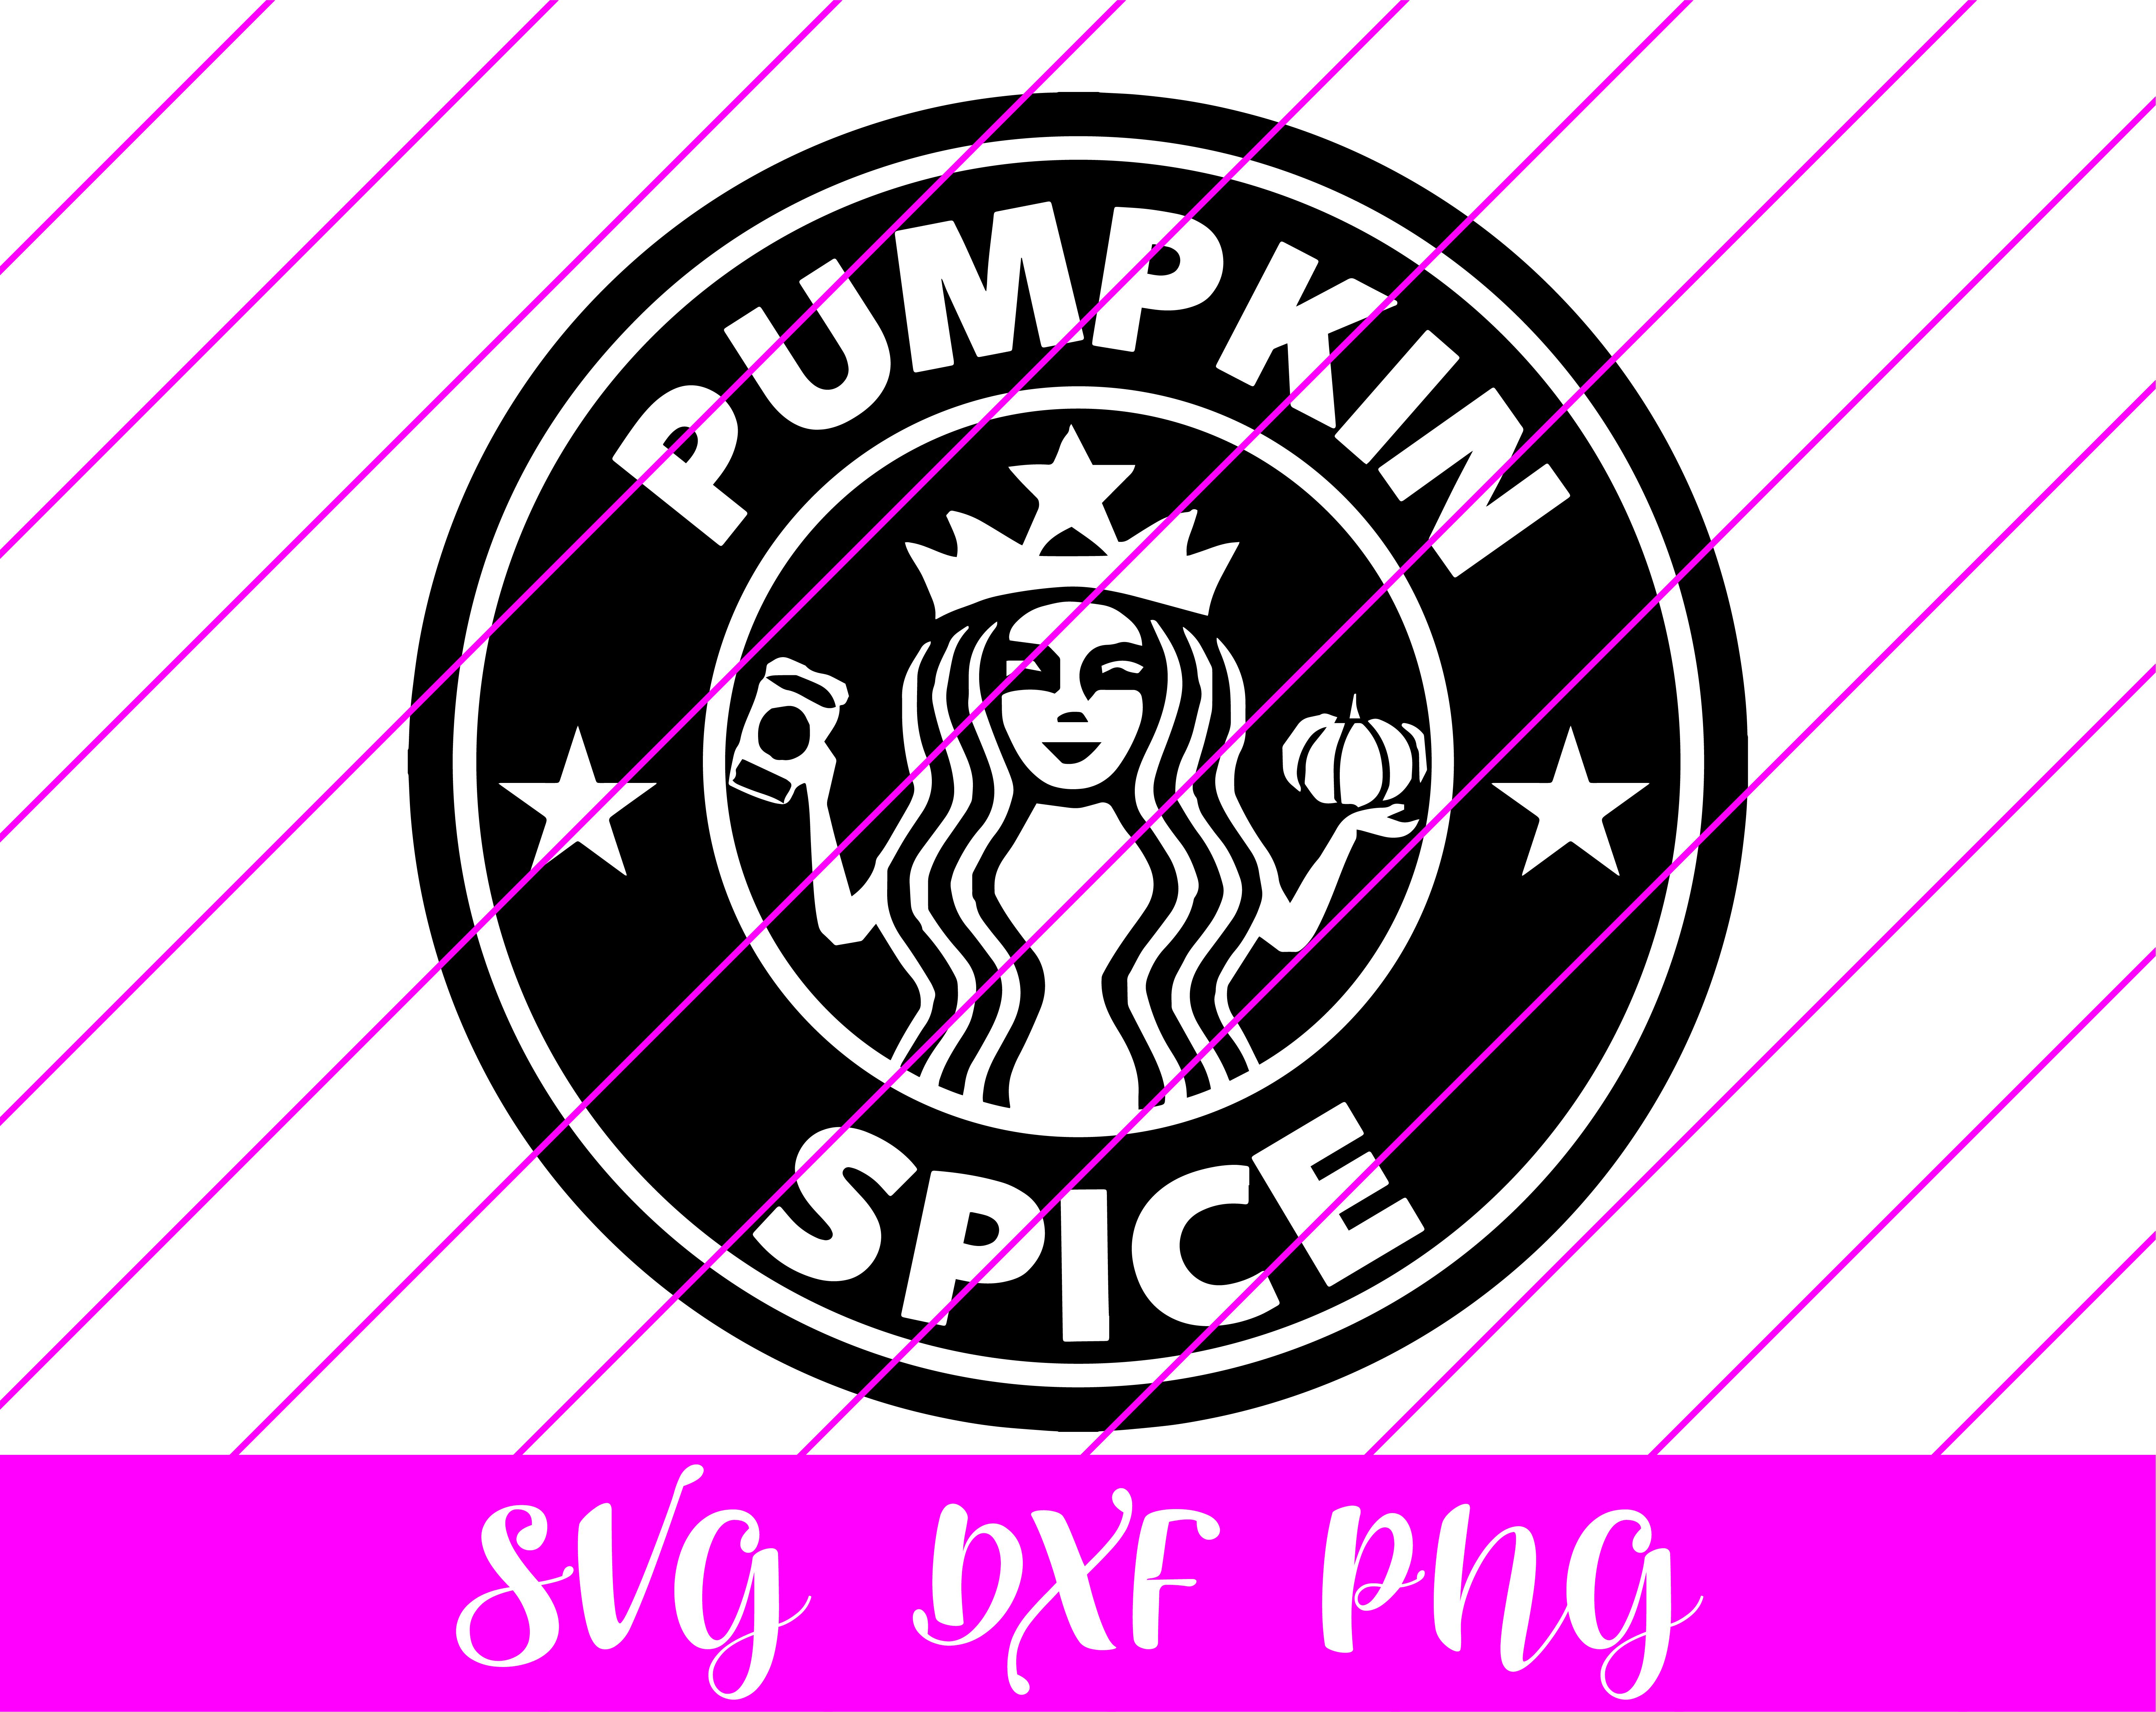 Pumpkin Spice Starbucks Logo Svg Free Pumpkin Spice Starbucks Logo Svg Download Svg Art